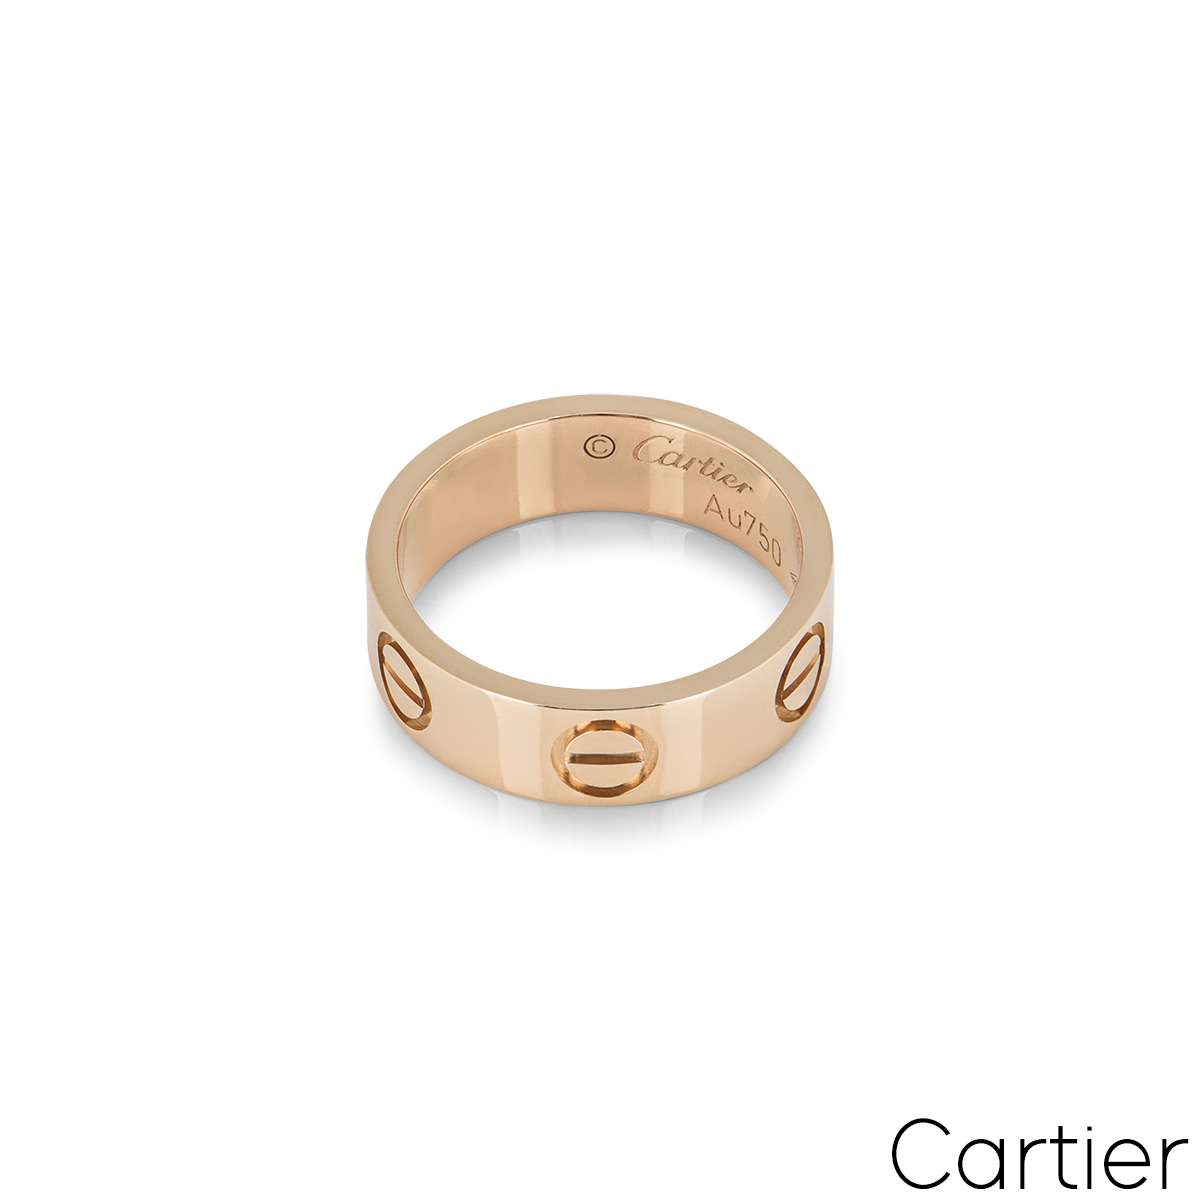 Cartier Rose Gold Plain Love Ring Size 47 B4084800